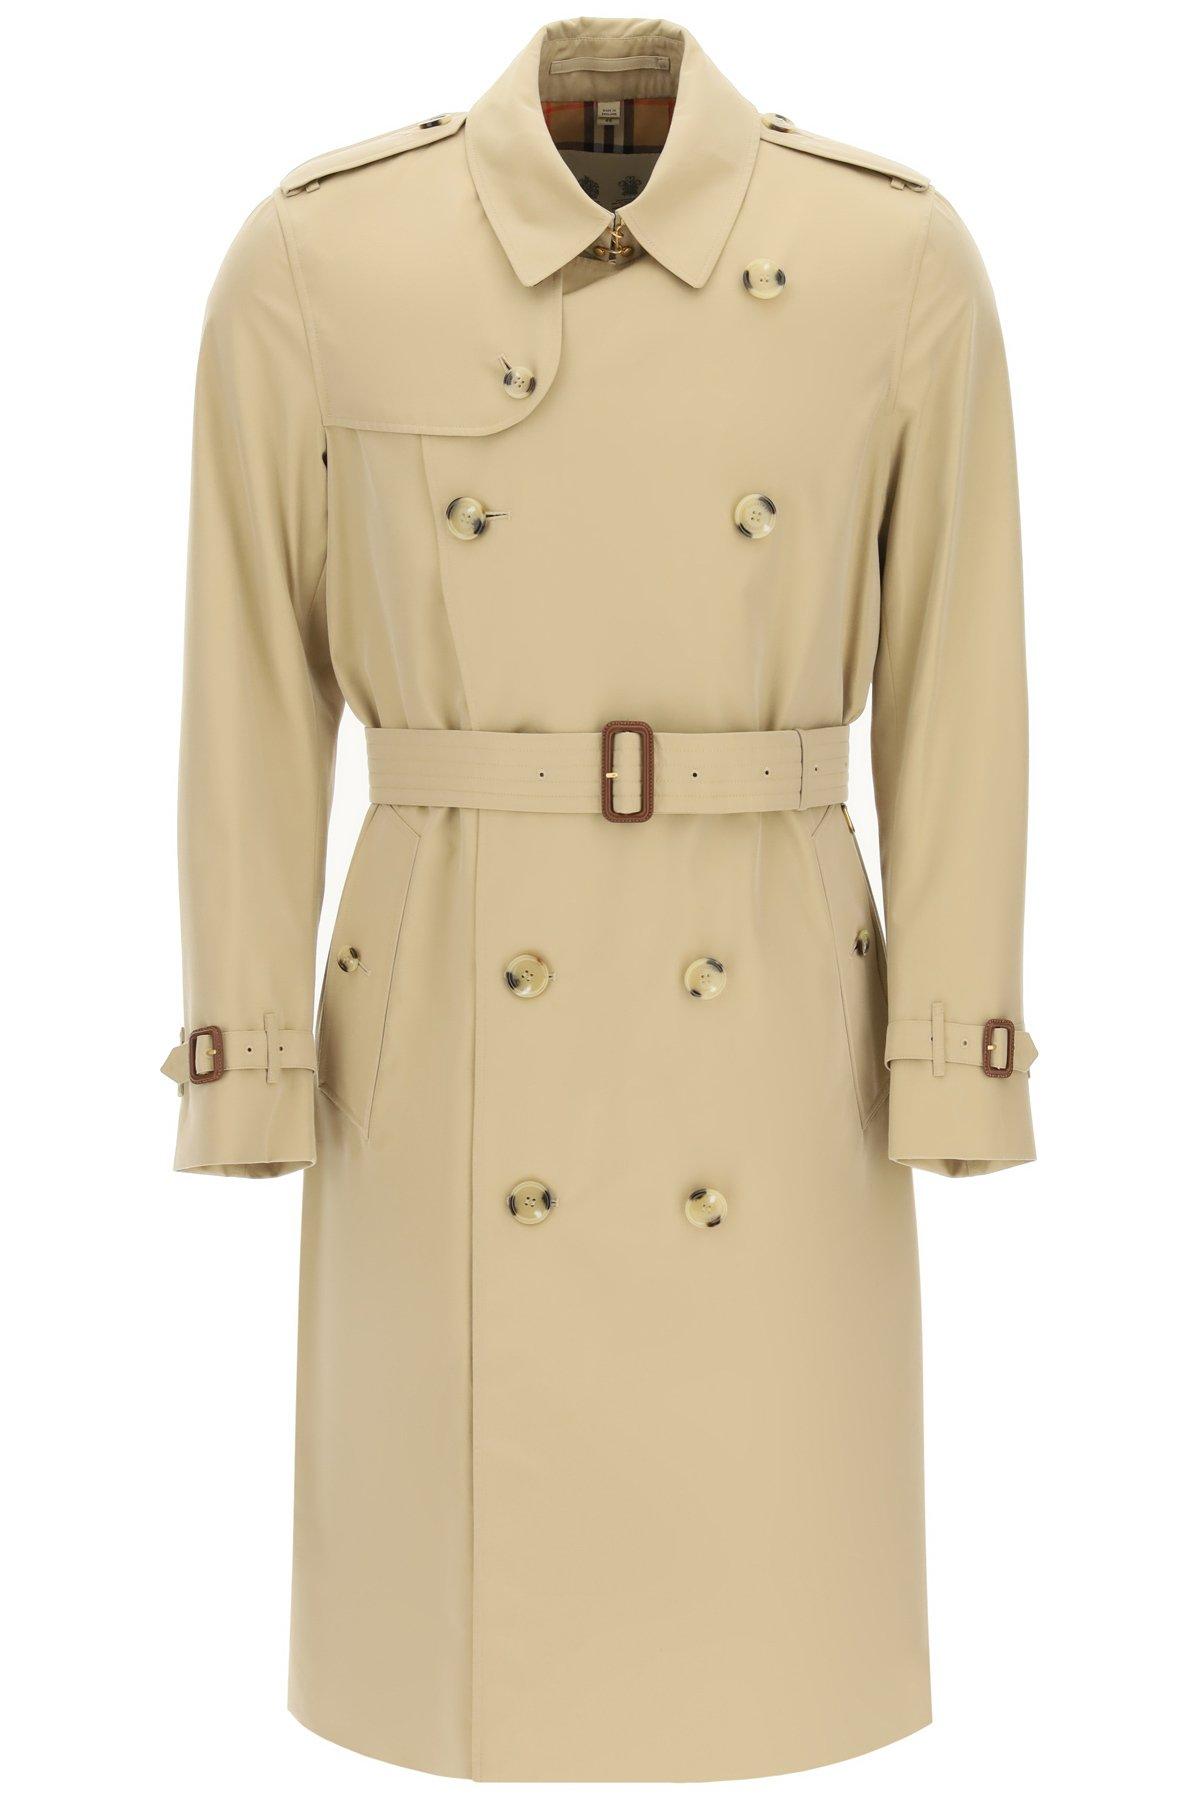 Burberry trench coat kensington lungo